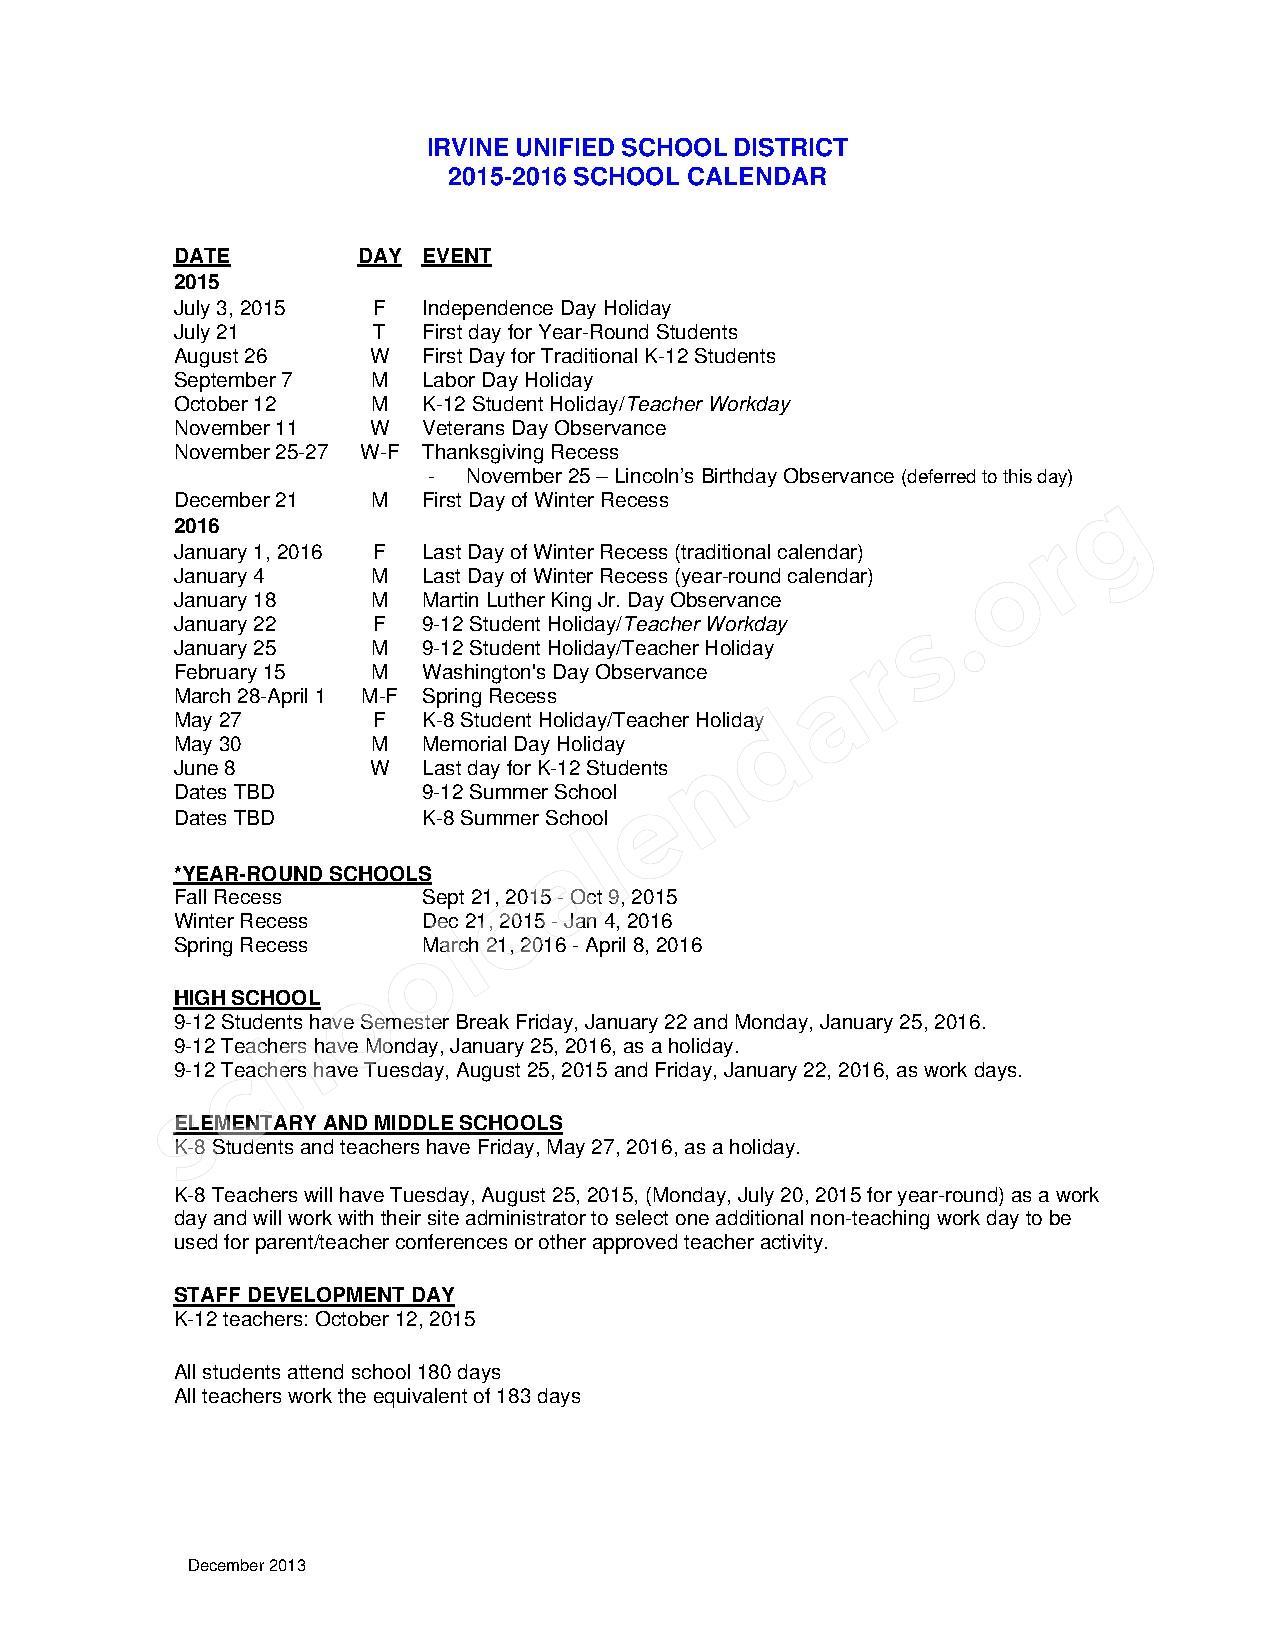 Irvine School District Calendar 2016 School Calendar Page